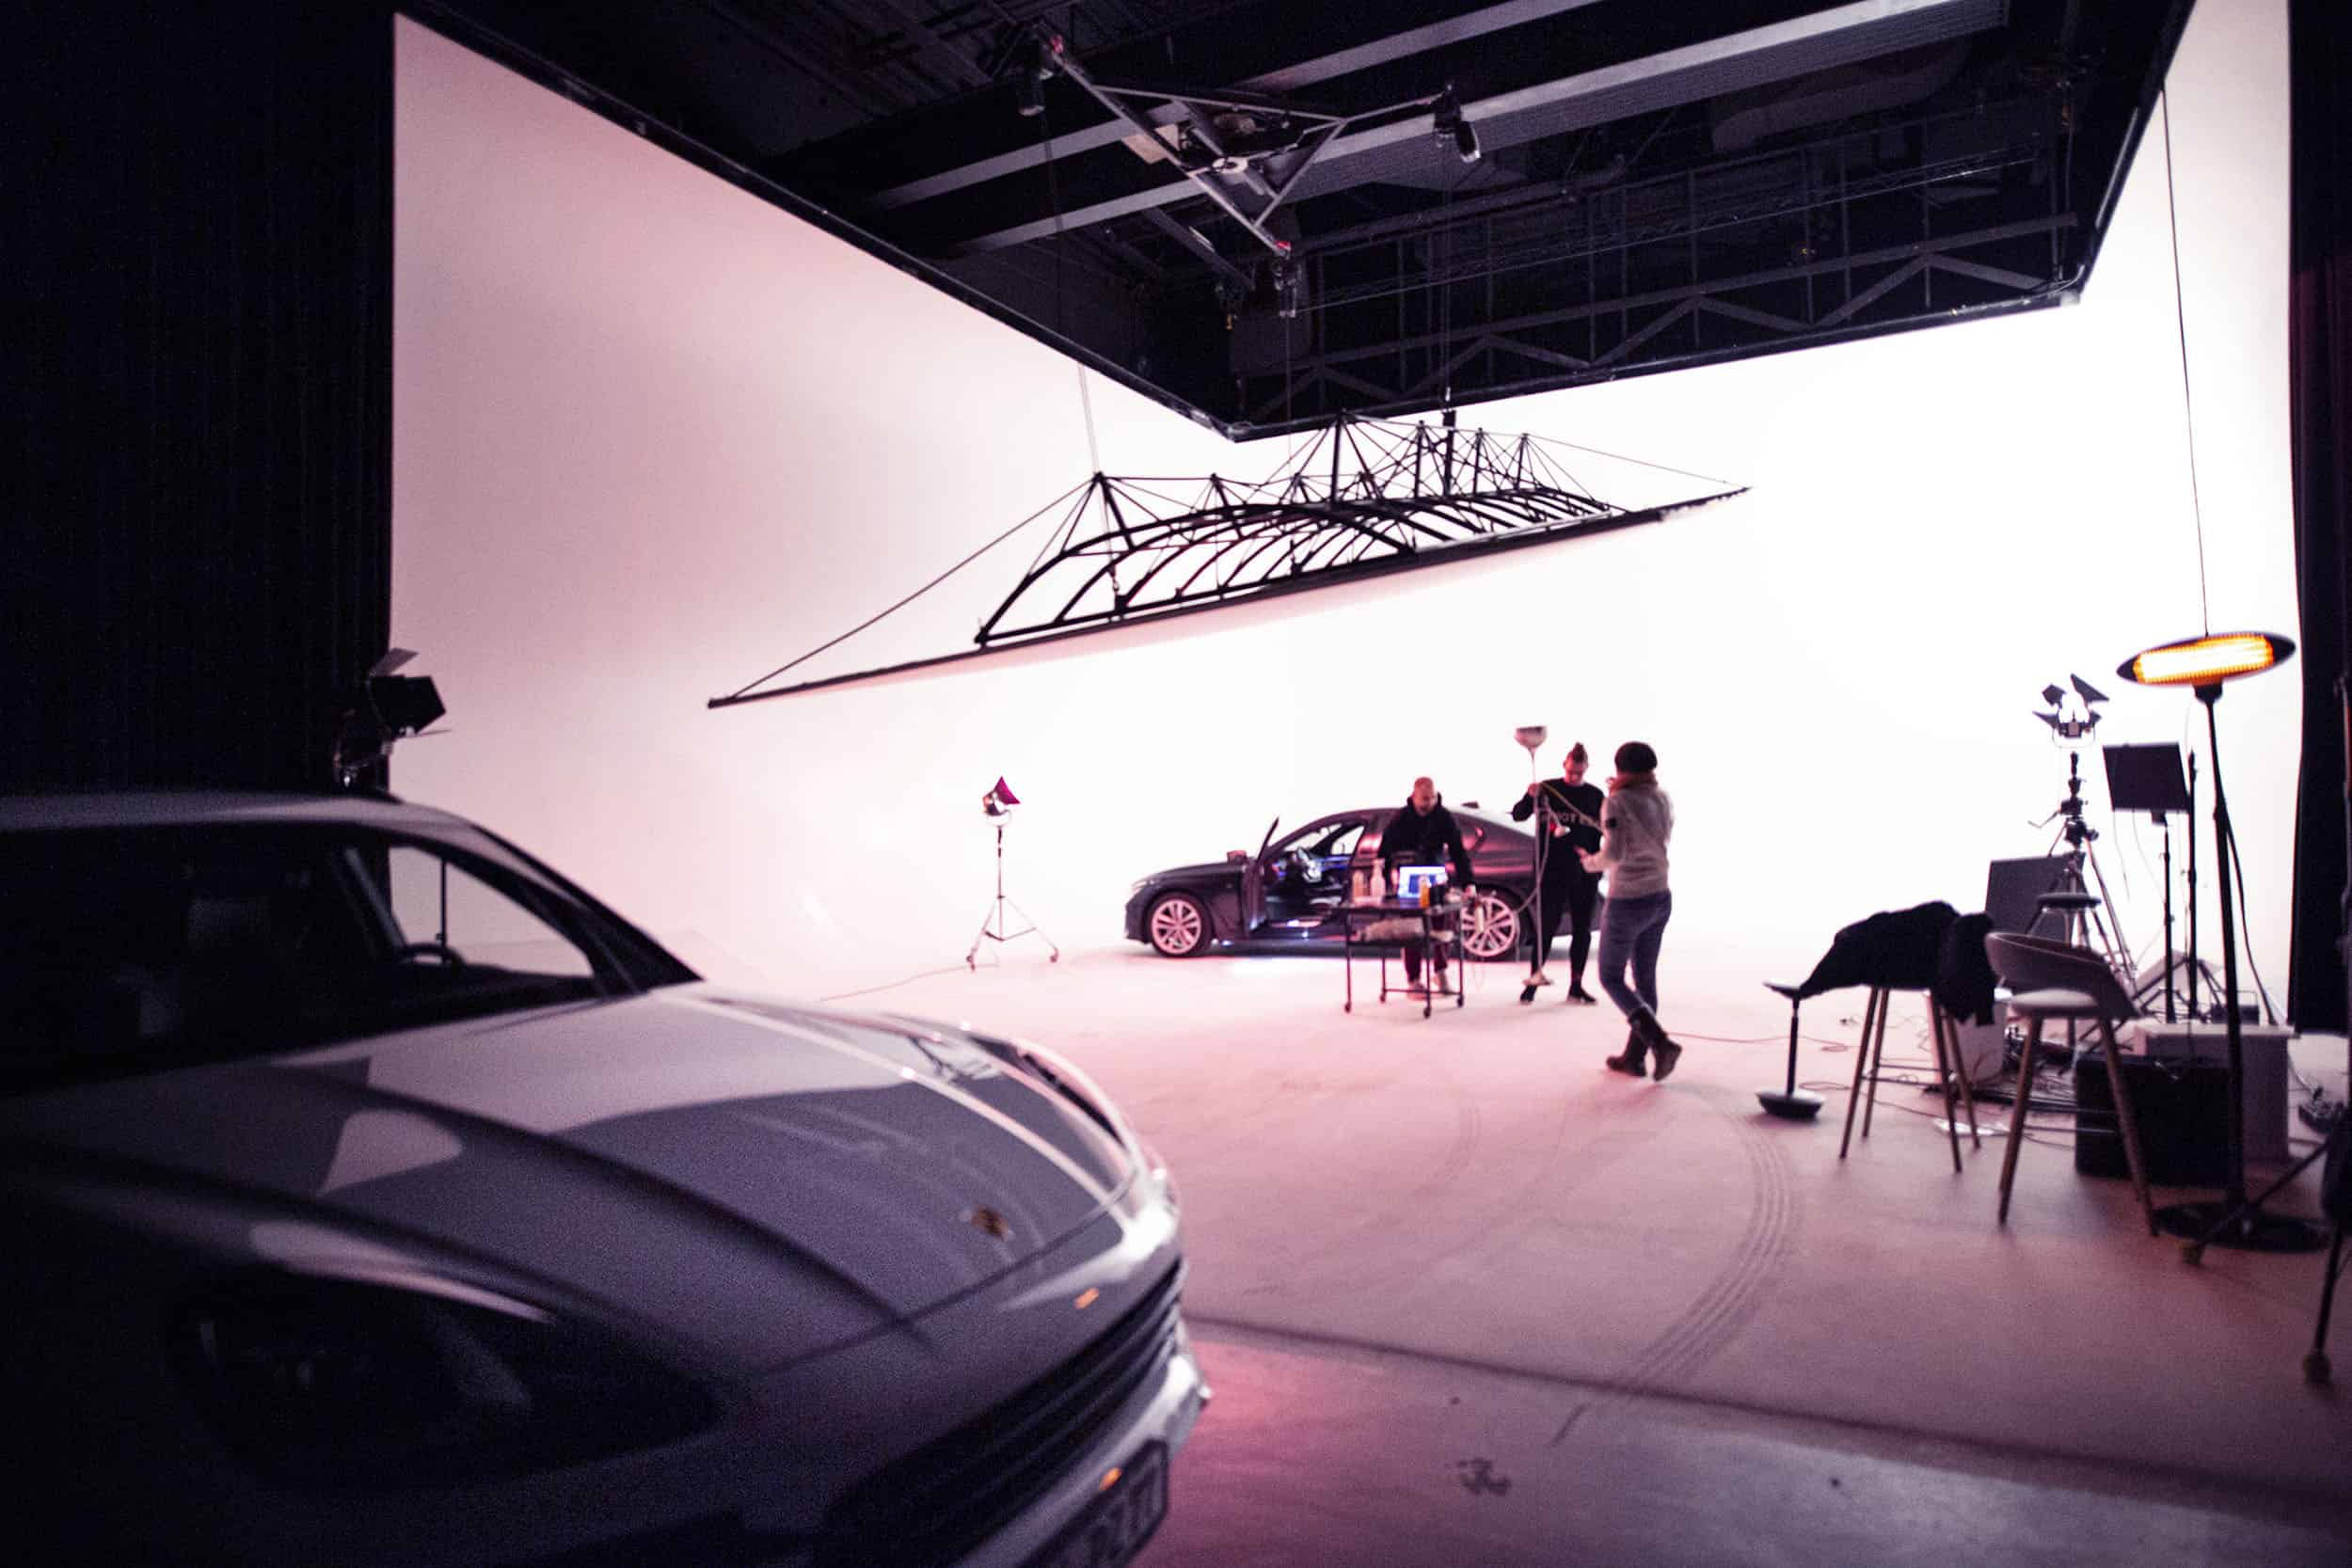 studio-ignatov-wkw-automotive-imagekampagne-makingof-06